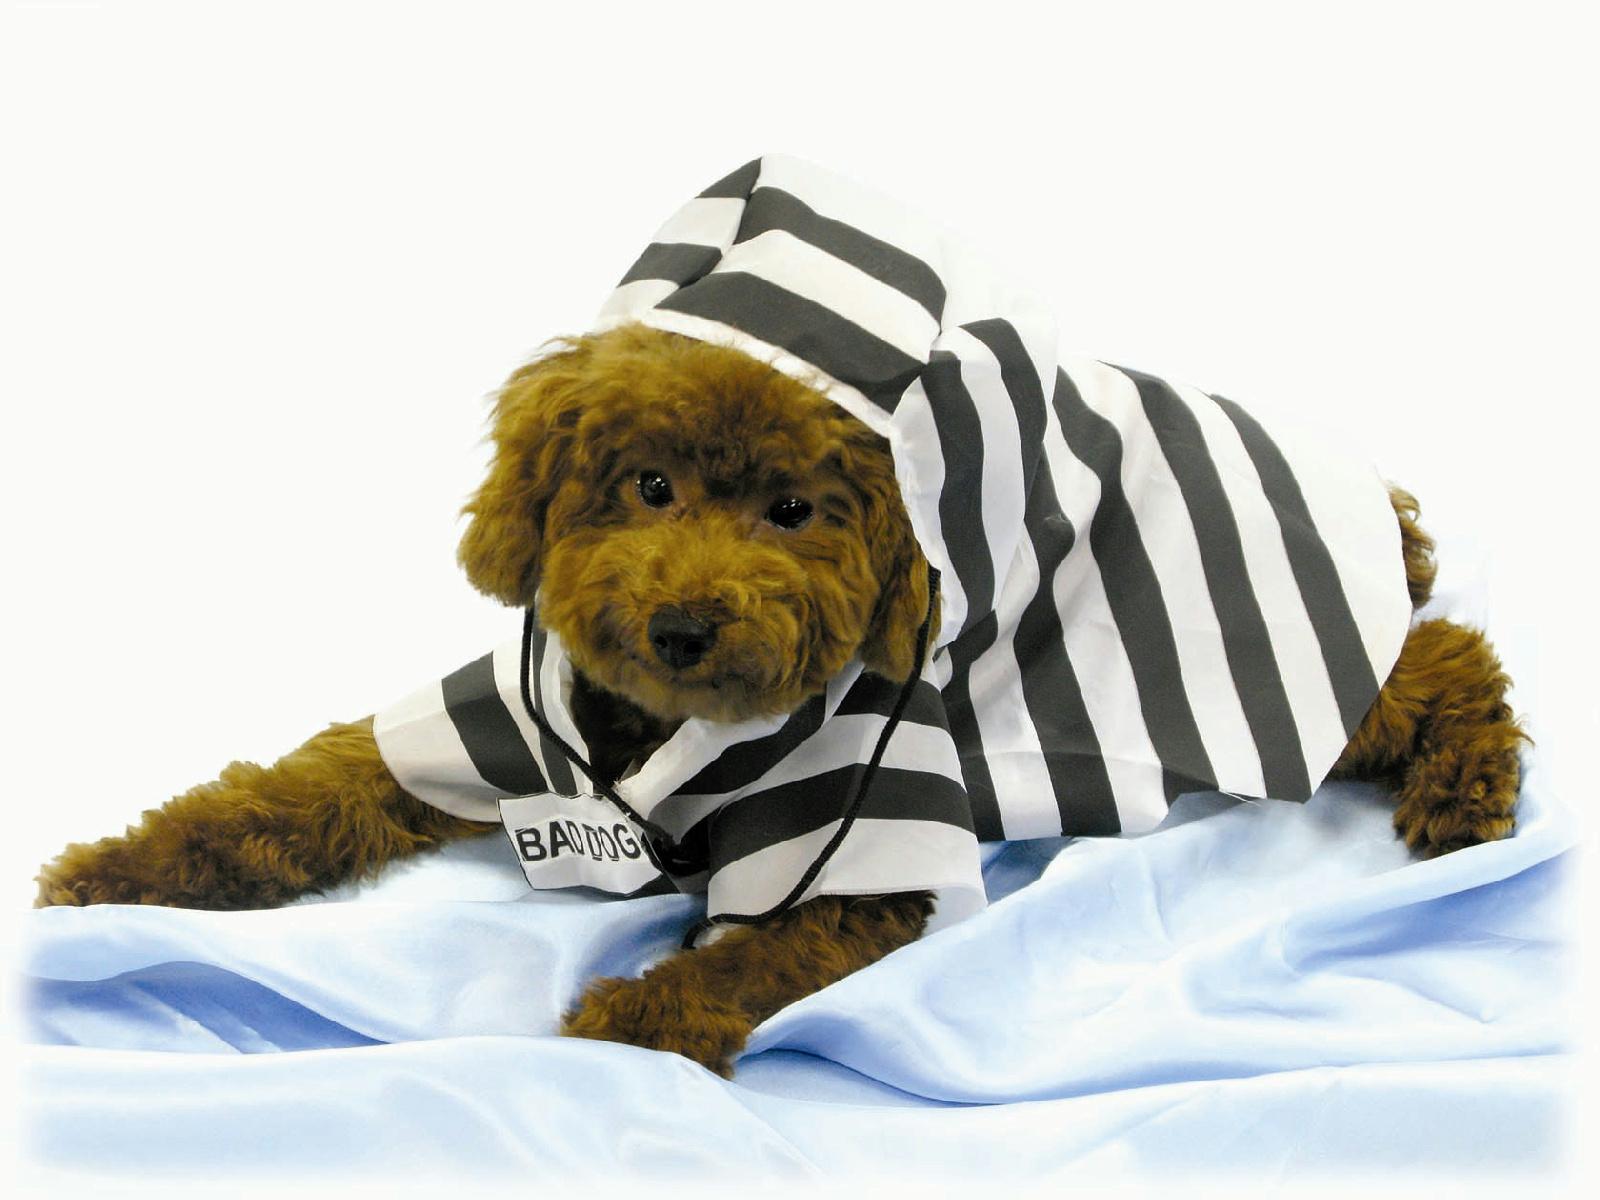 Prisoner Pet Halloween Costume Jail Bird Bad Dog